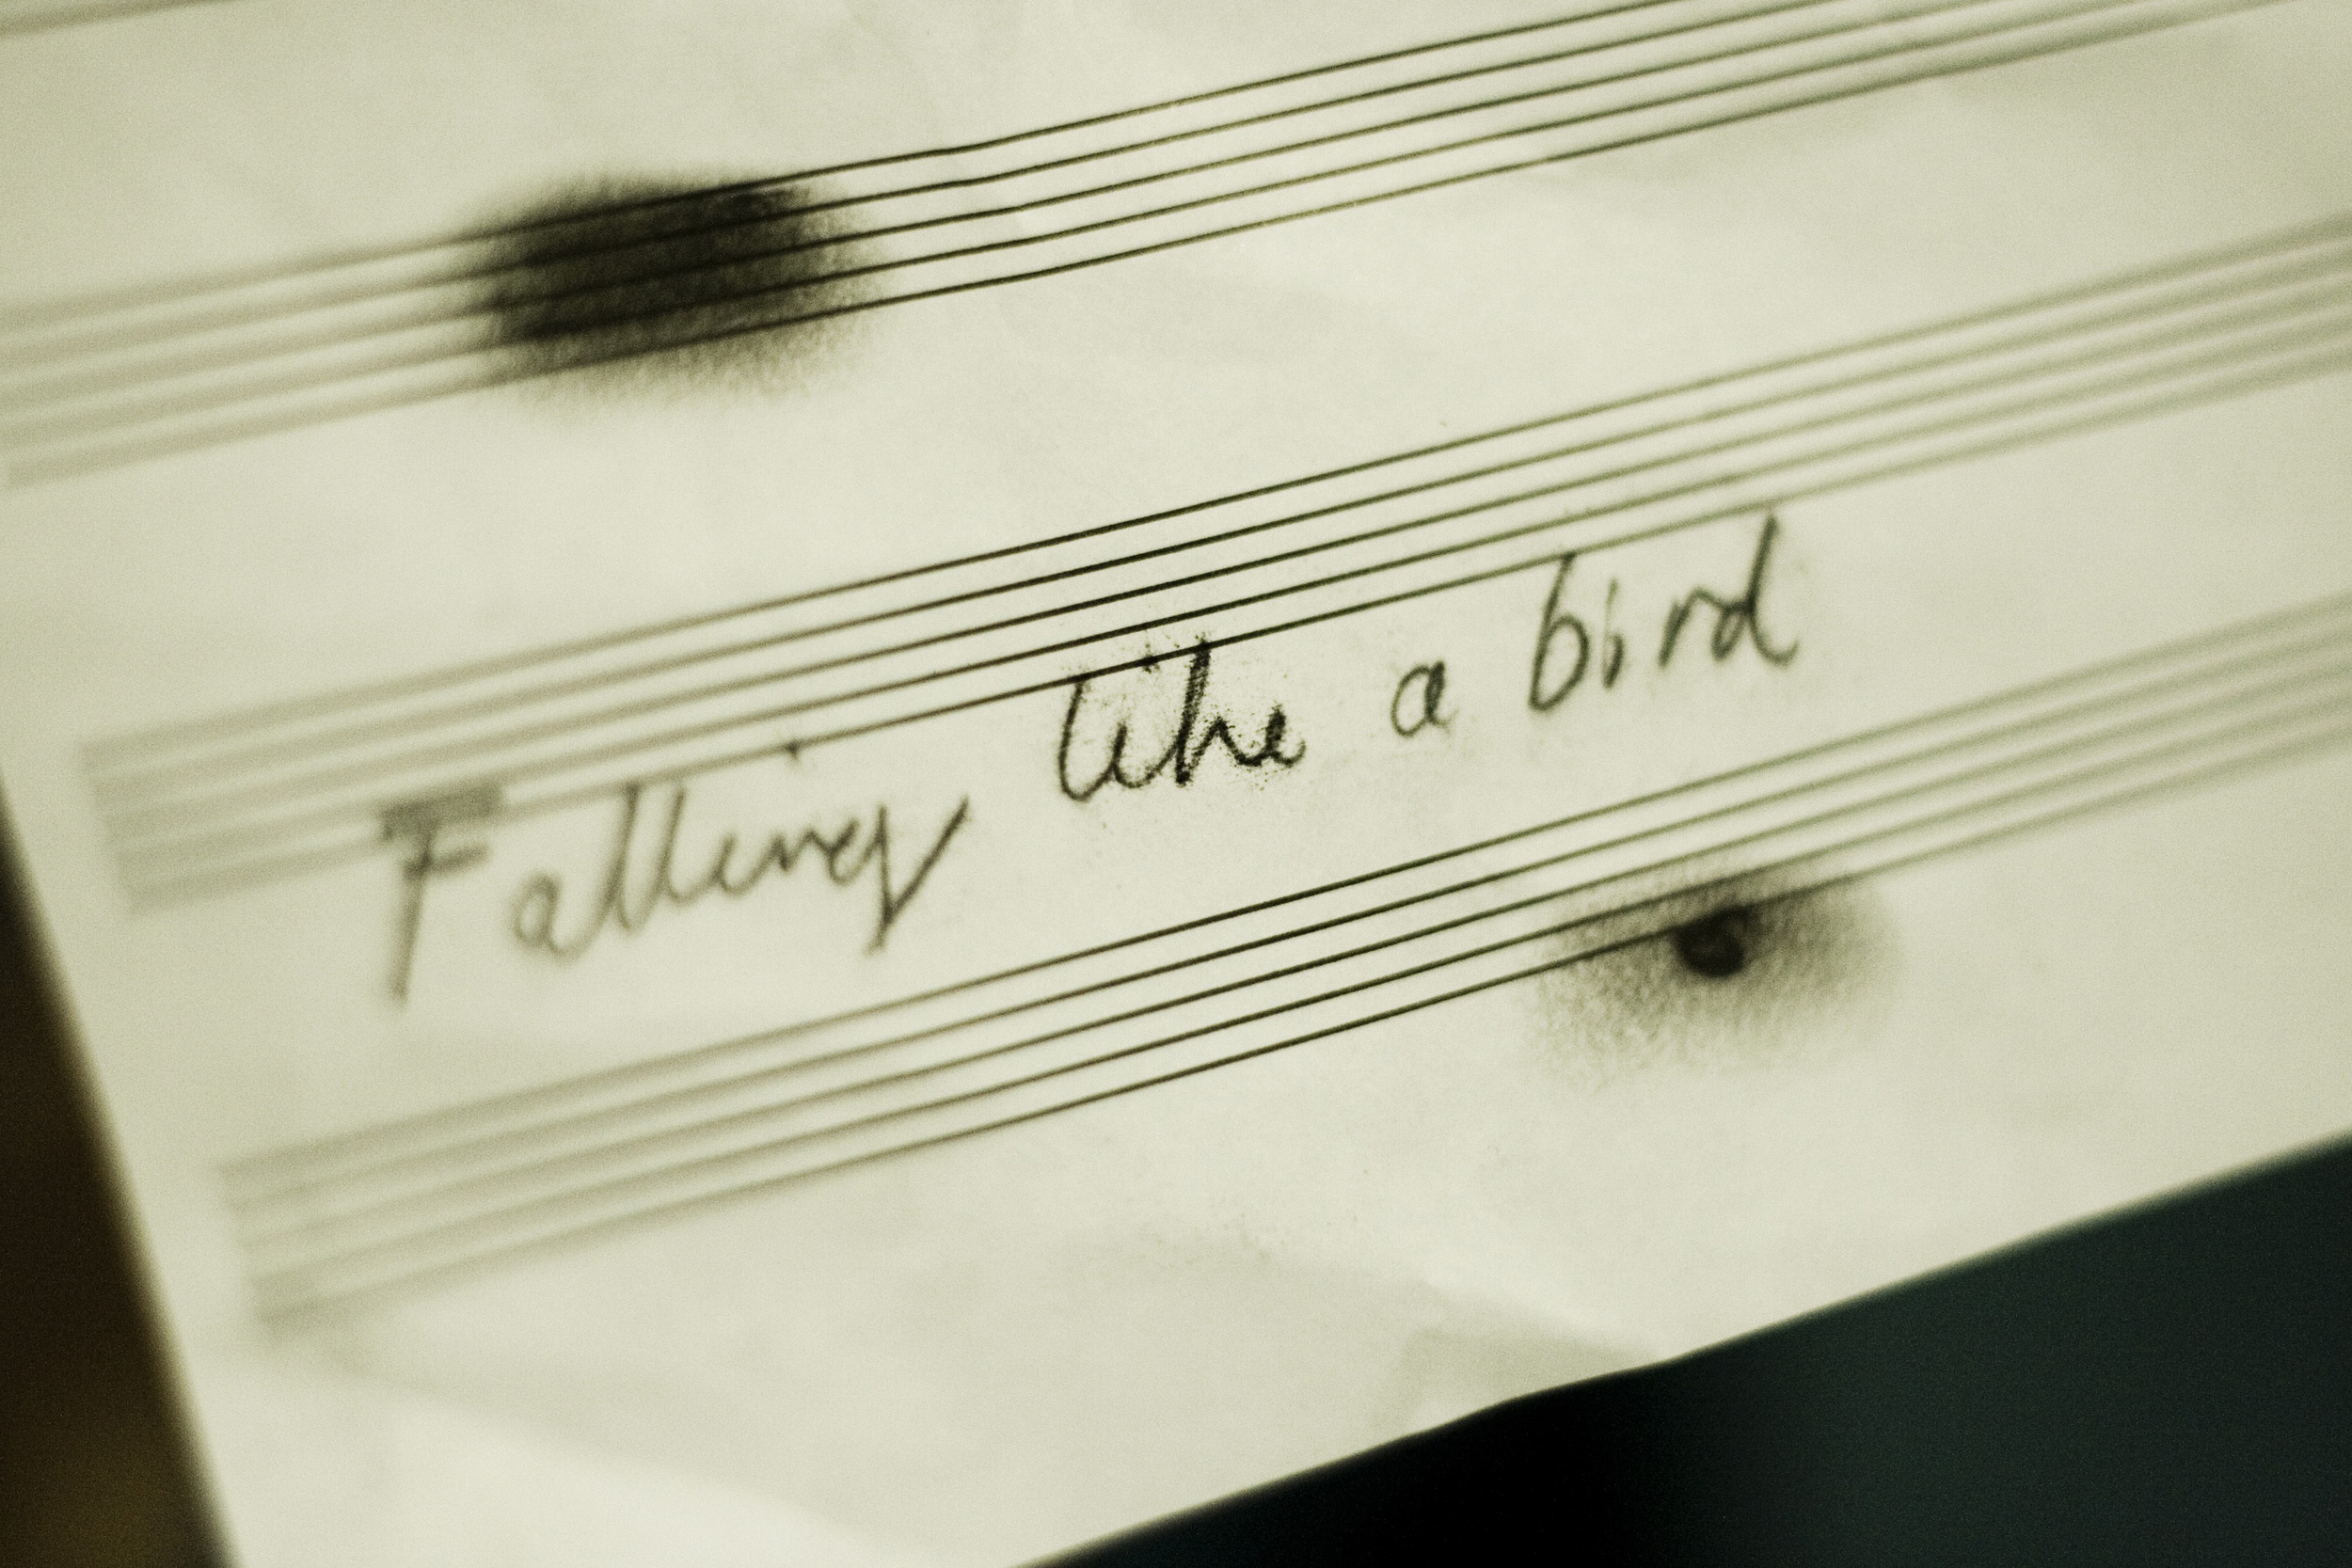 Falling like a bird (2016)